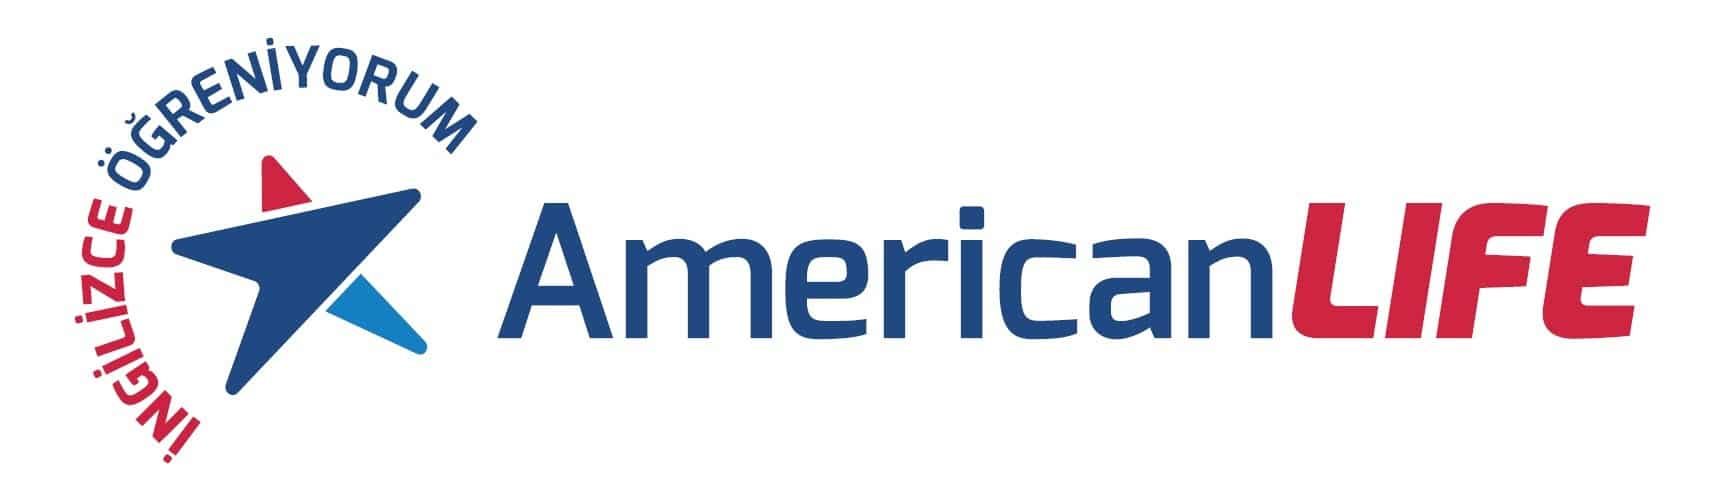 americanlife-dilokullari